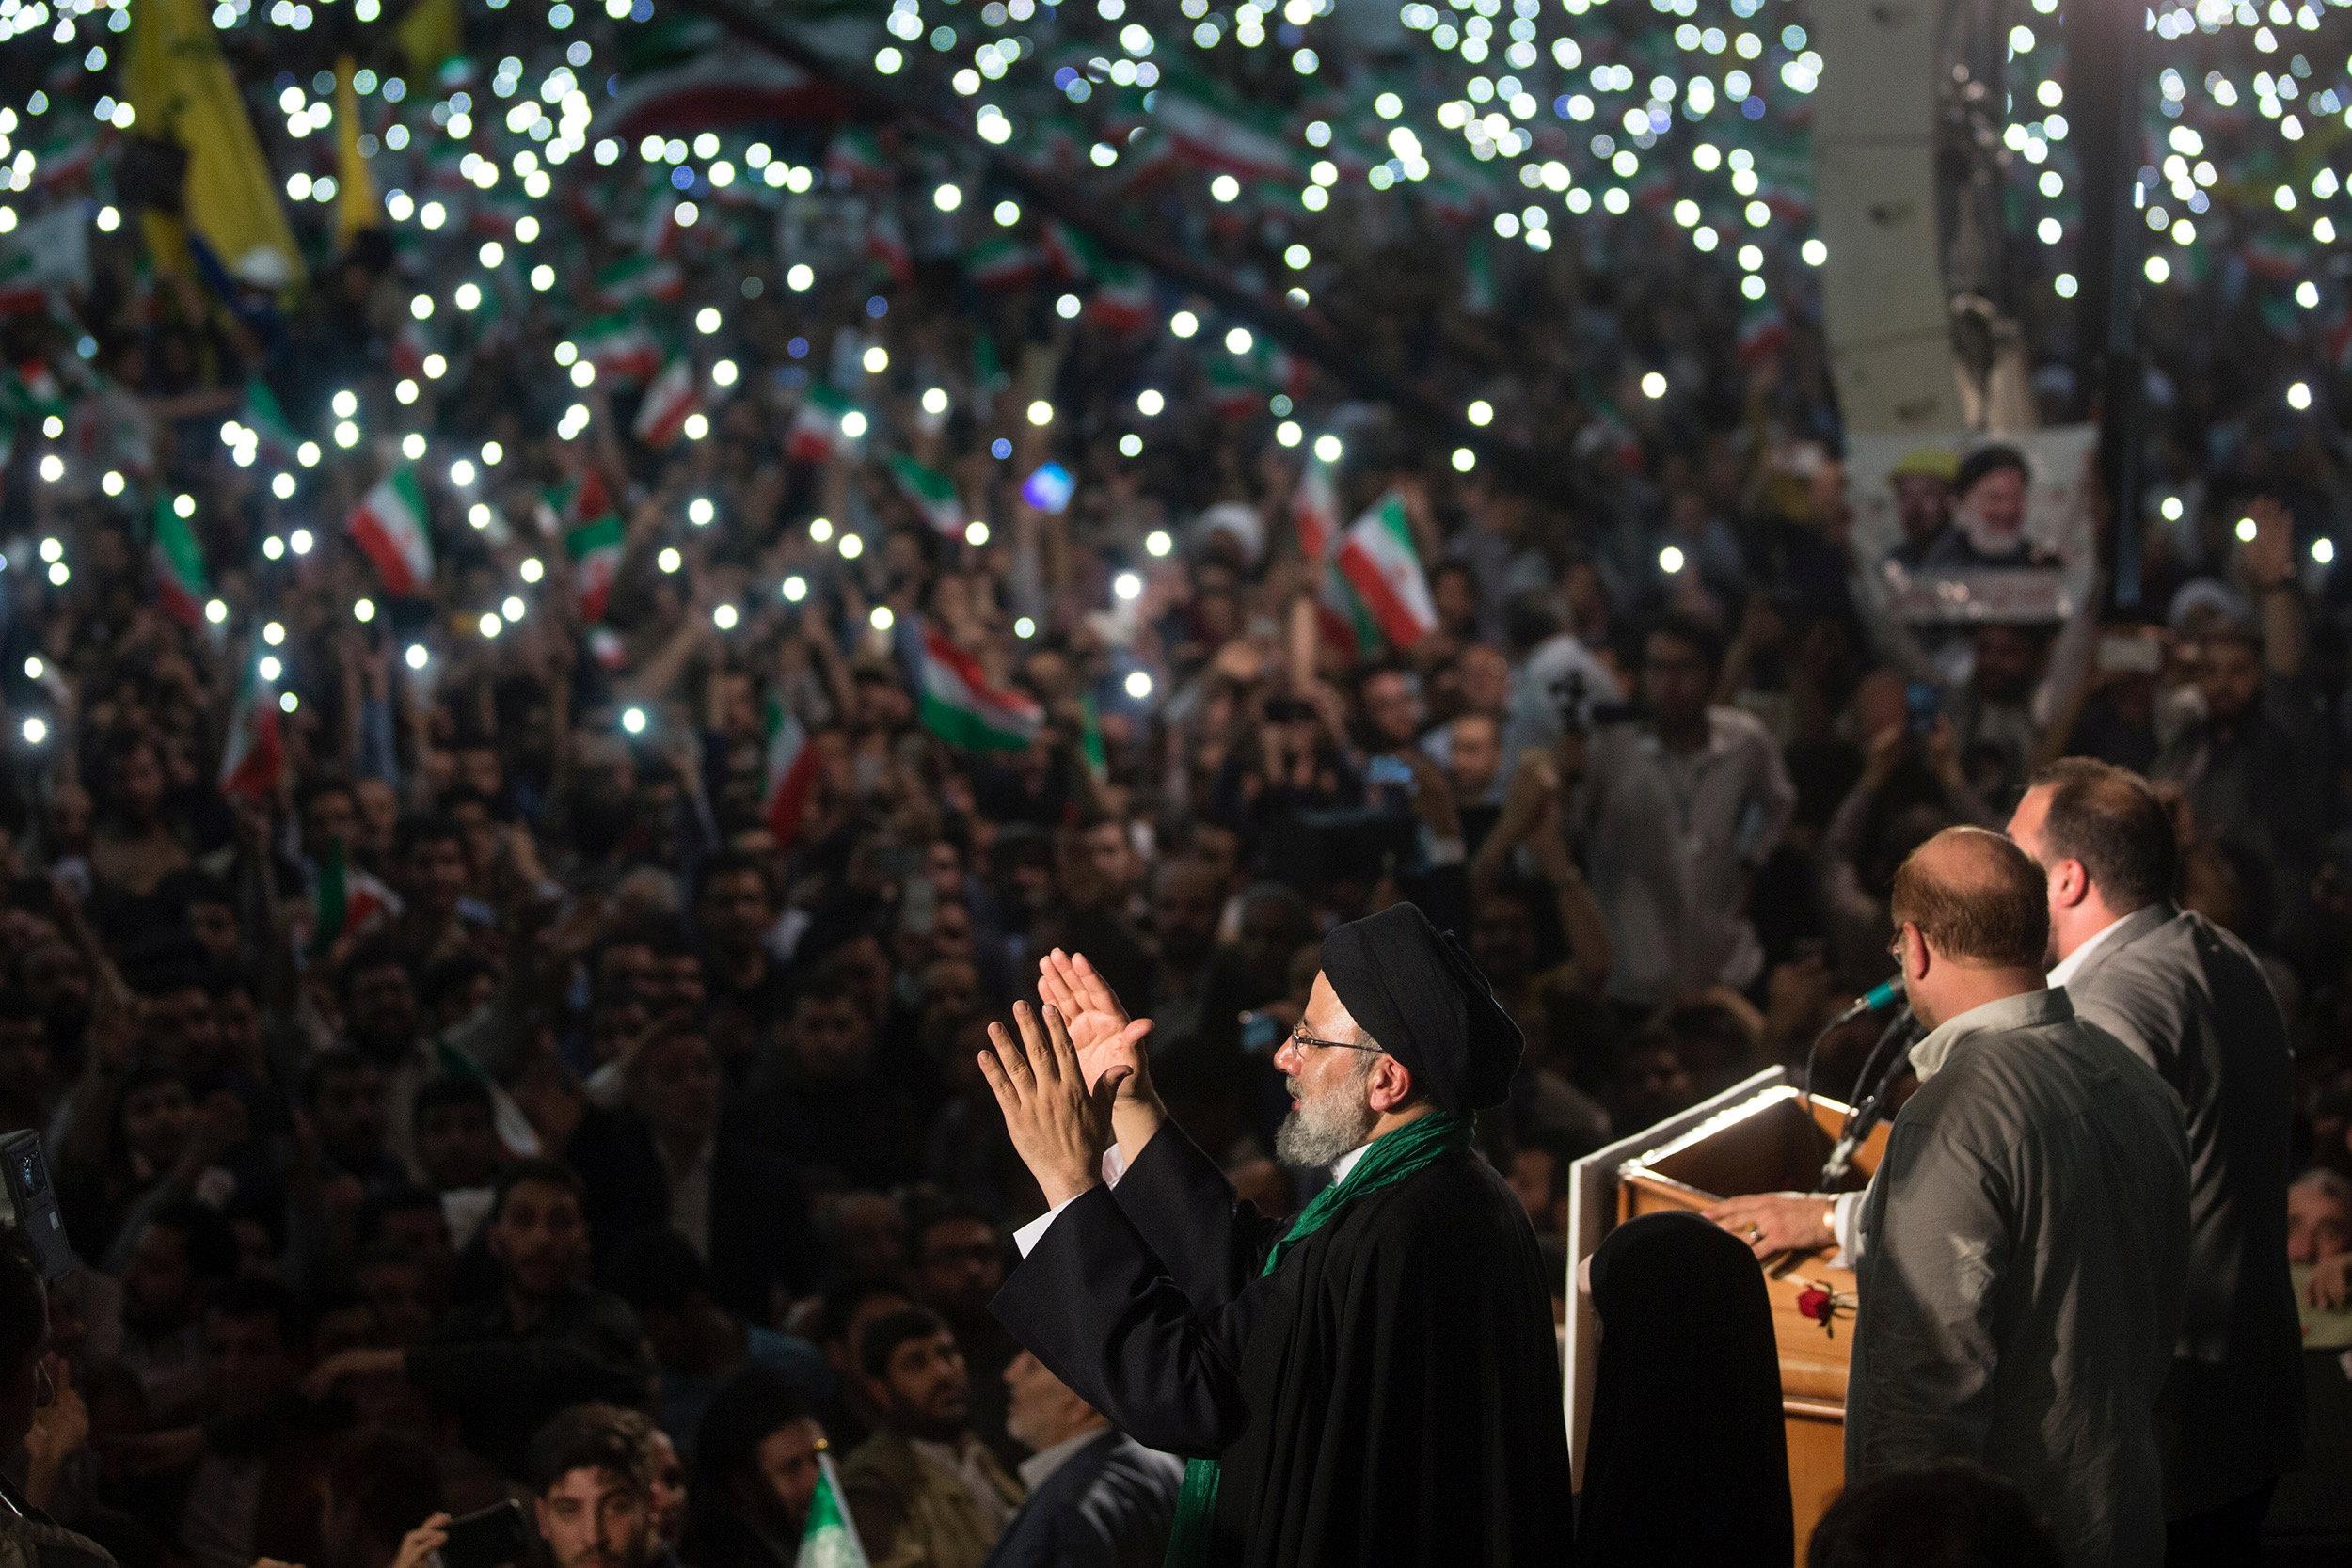 2017 05 16T190946Z 452553856 RC16BFDAB180 RTRMADP 3 IRAN ELECTION